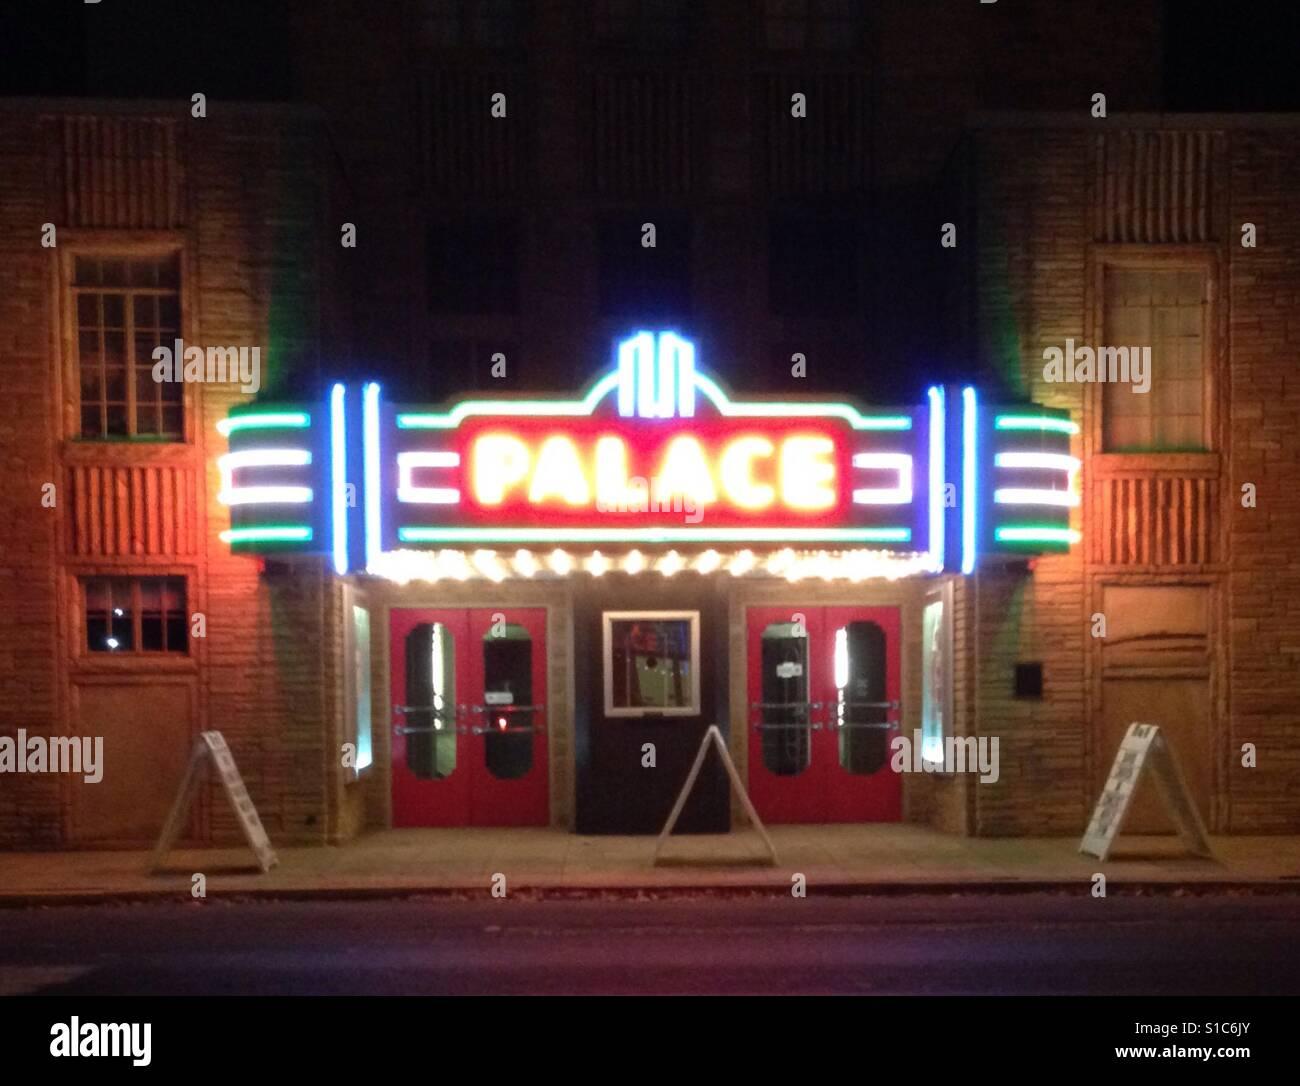 Schlosstheater in der Nacht Stockbild